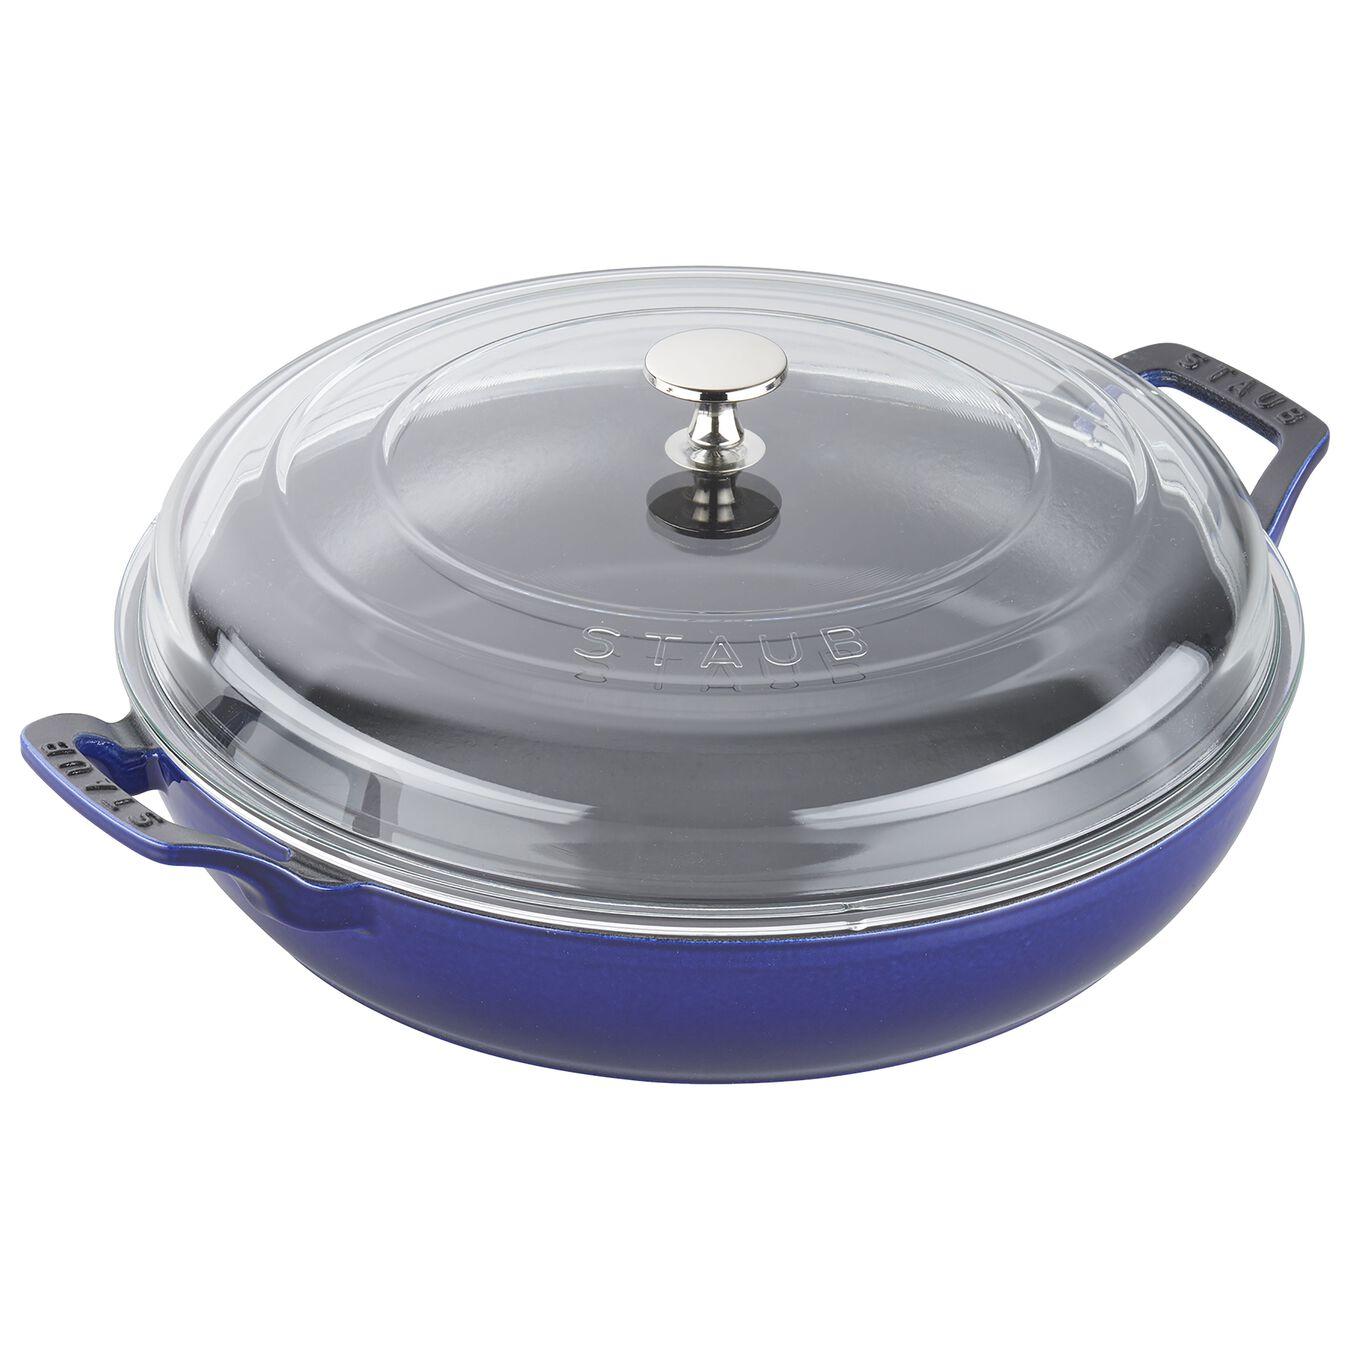 3.5-qt Braiser with Glass Lid - Dark Blue,,large 1